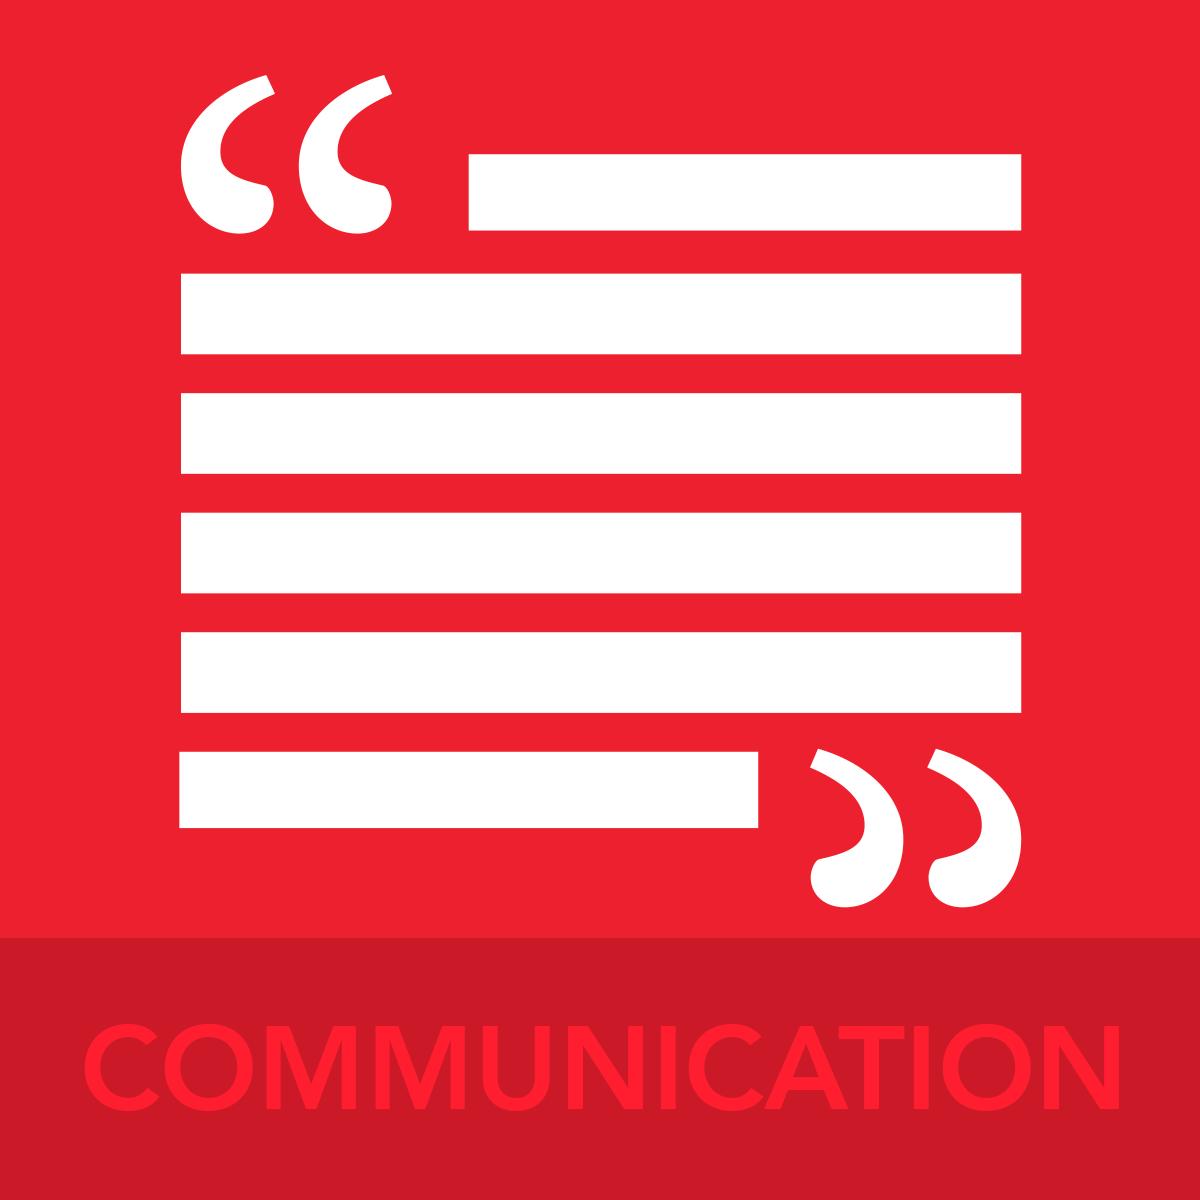 COMMUNICATION ICON BUTTON